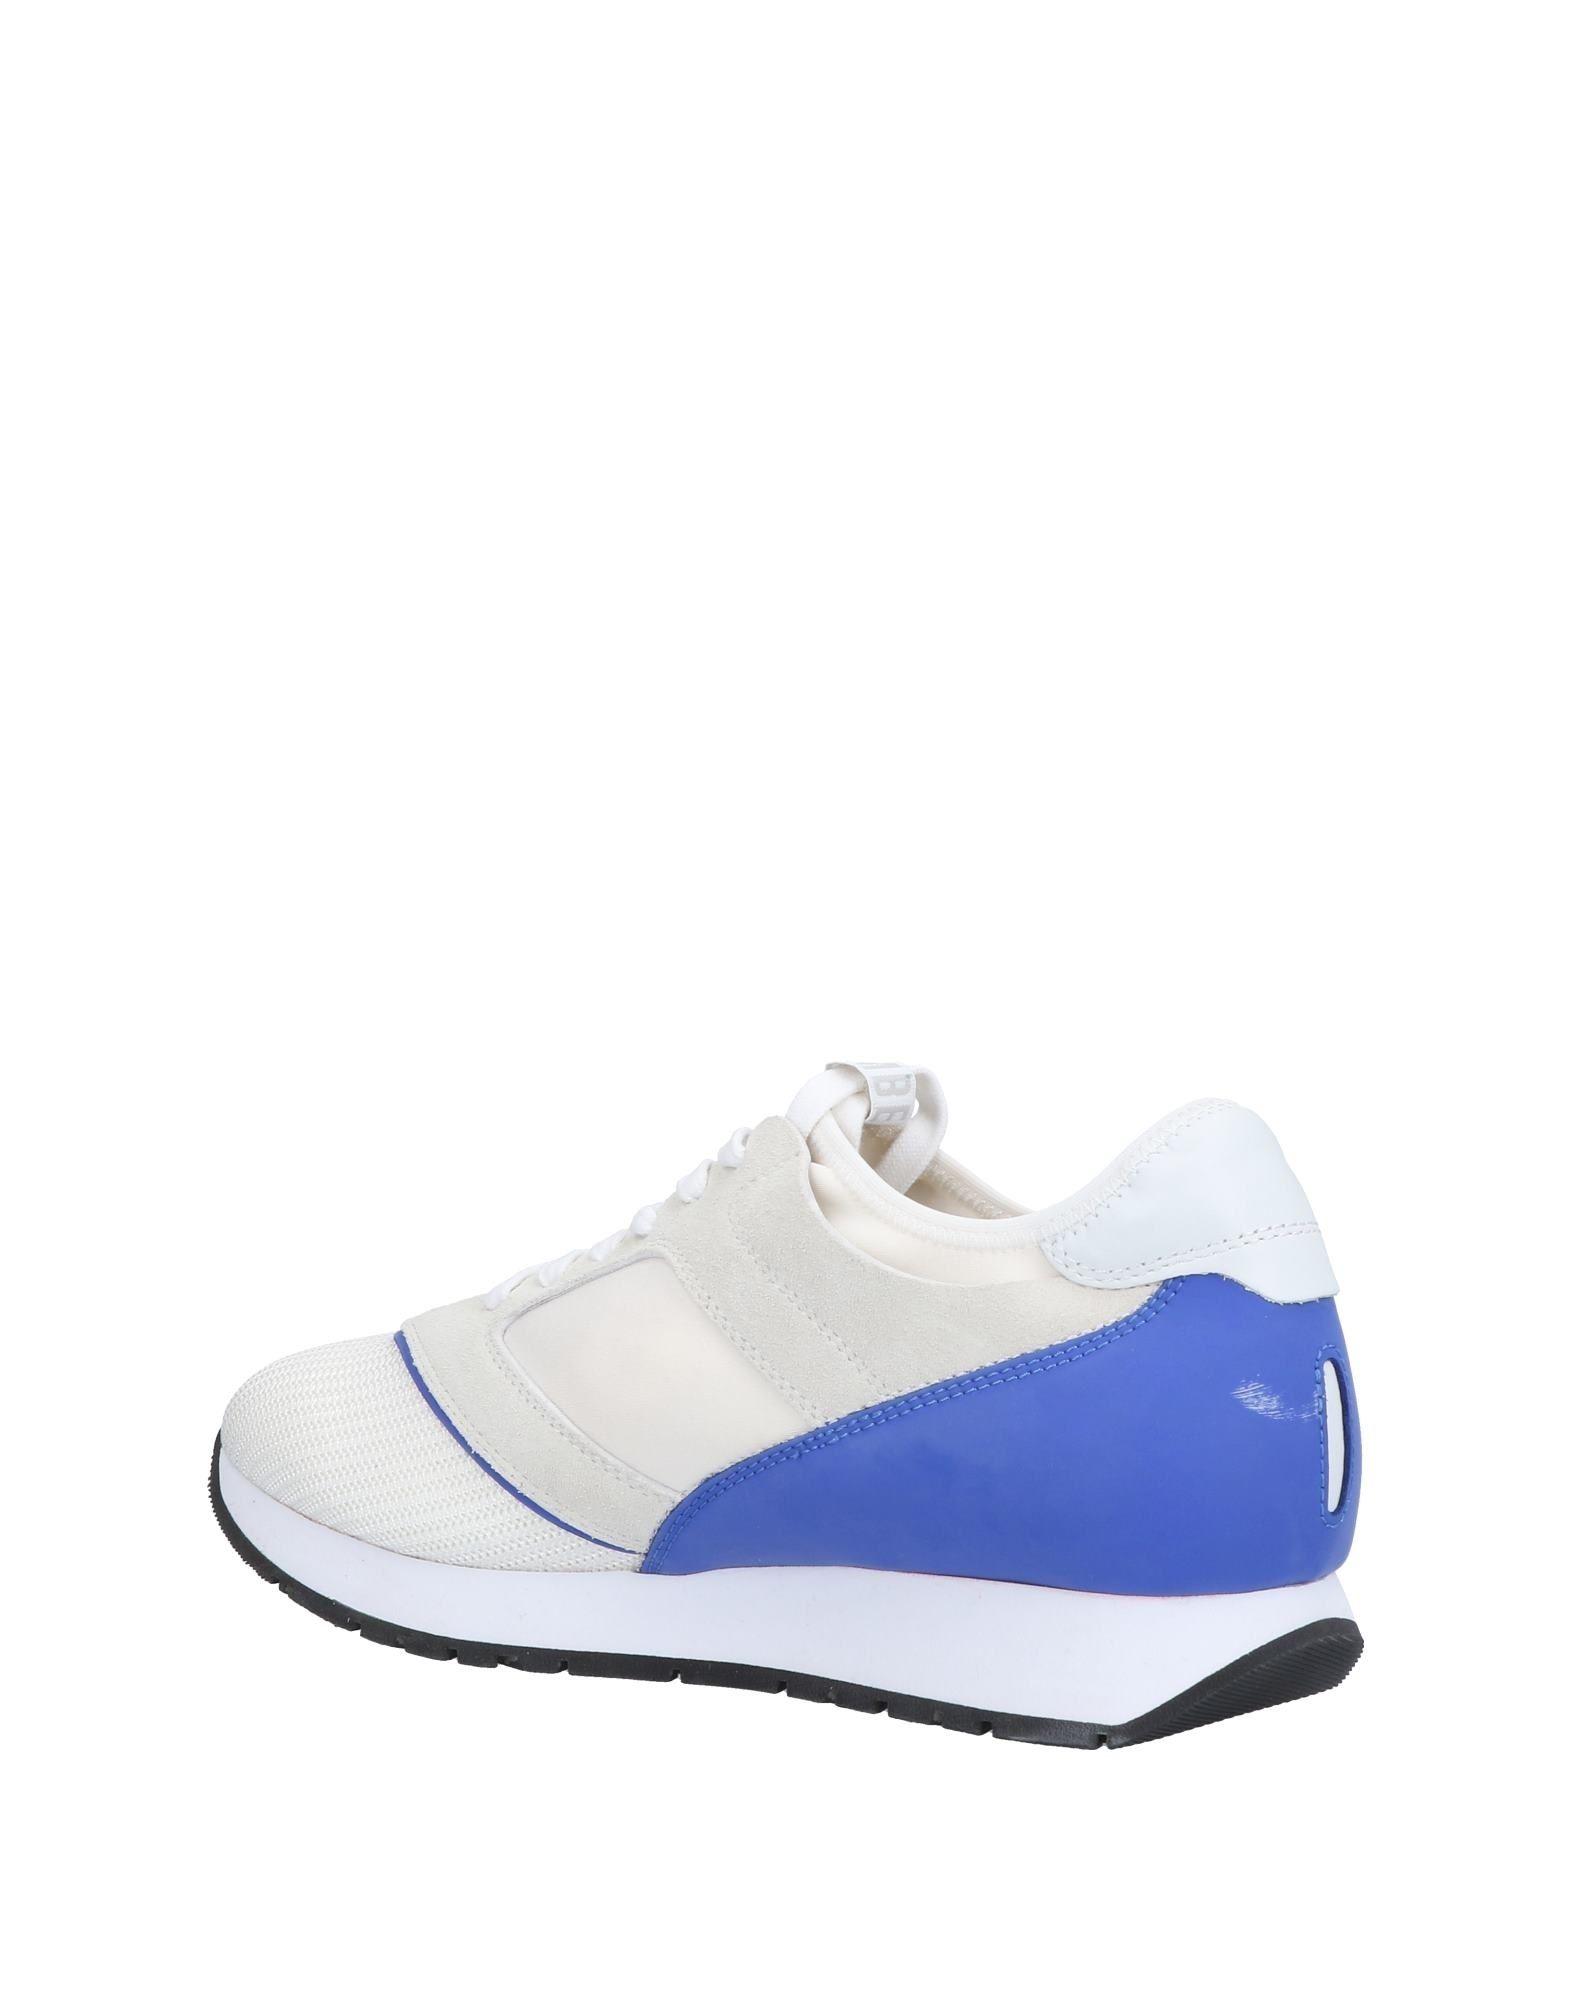 Bikkembergs Bikkembergs  Sneakers Herren  11461217CA 9c4b21